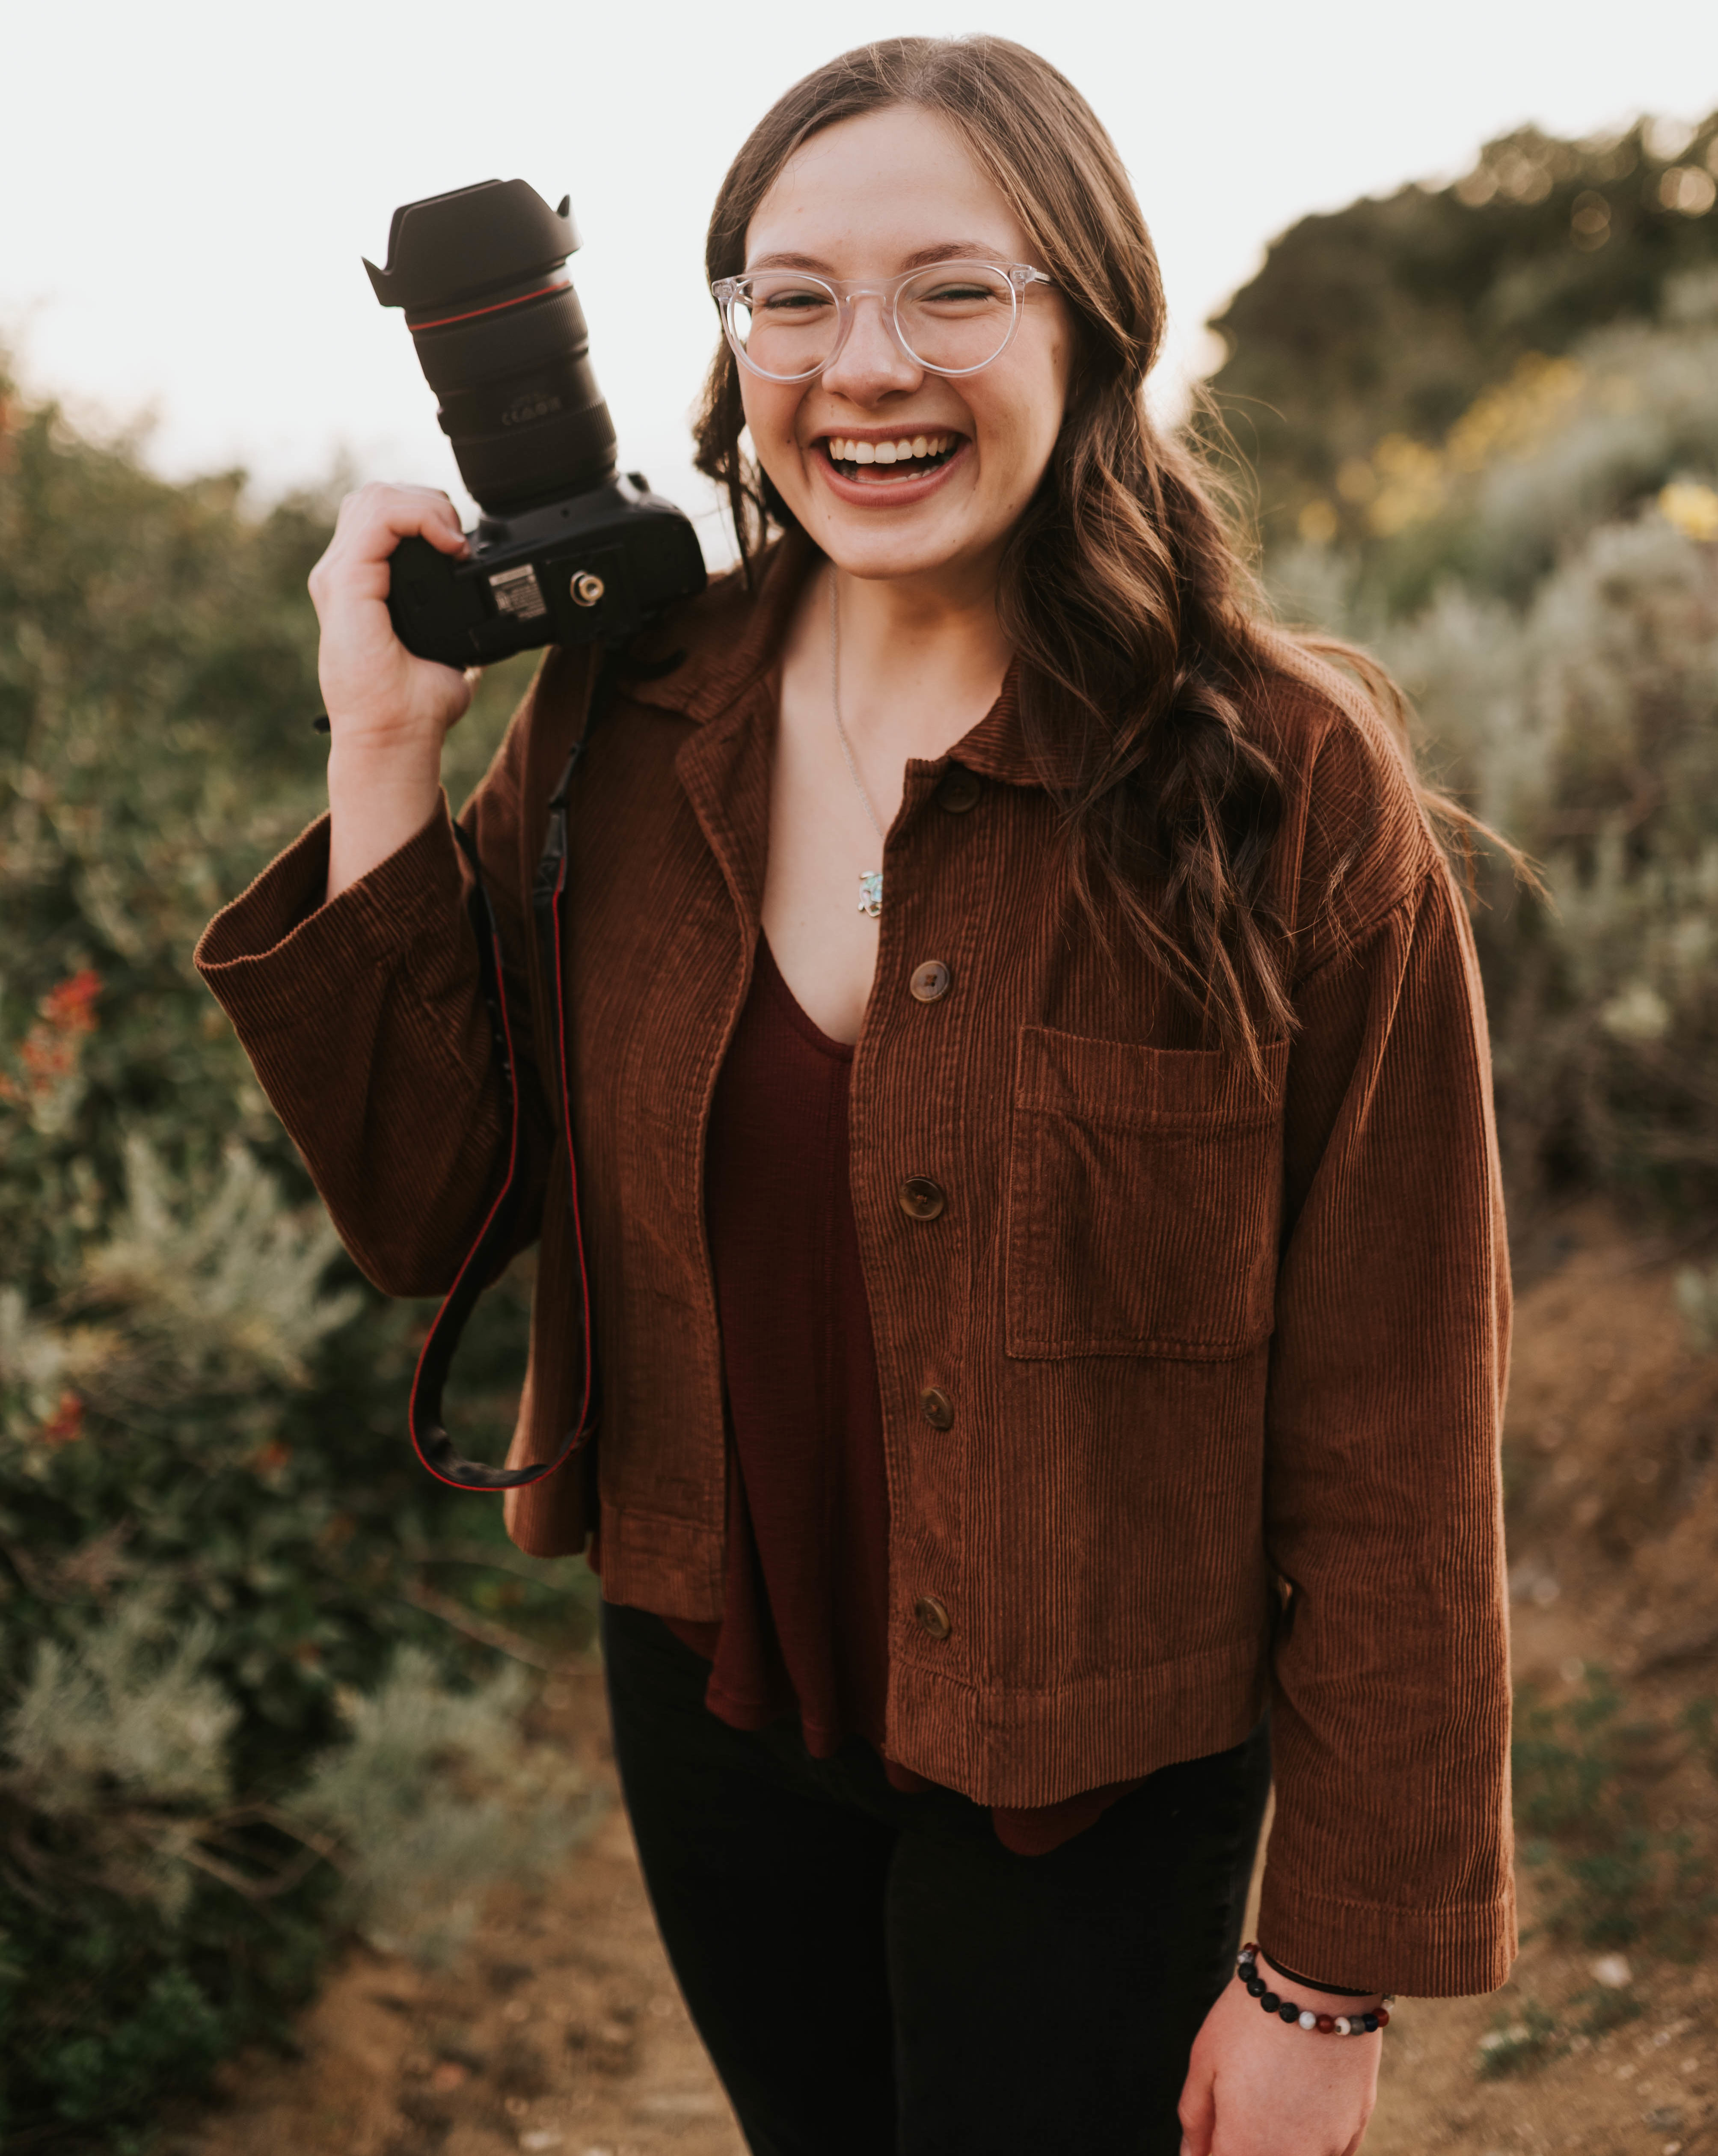 Wedding Photographer Natalia Wajda: Capturing Life's Special Moments